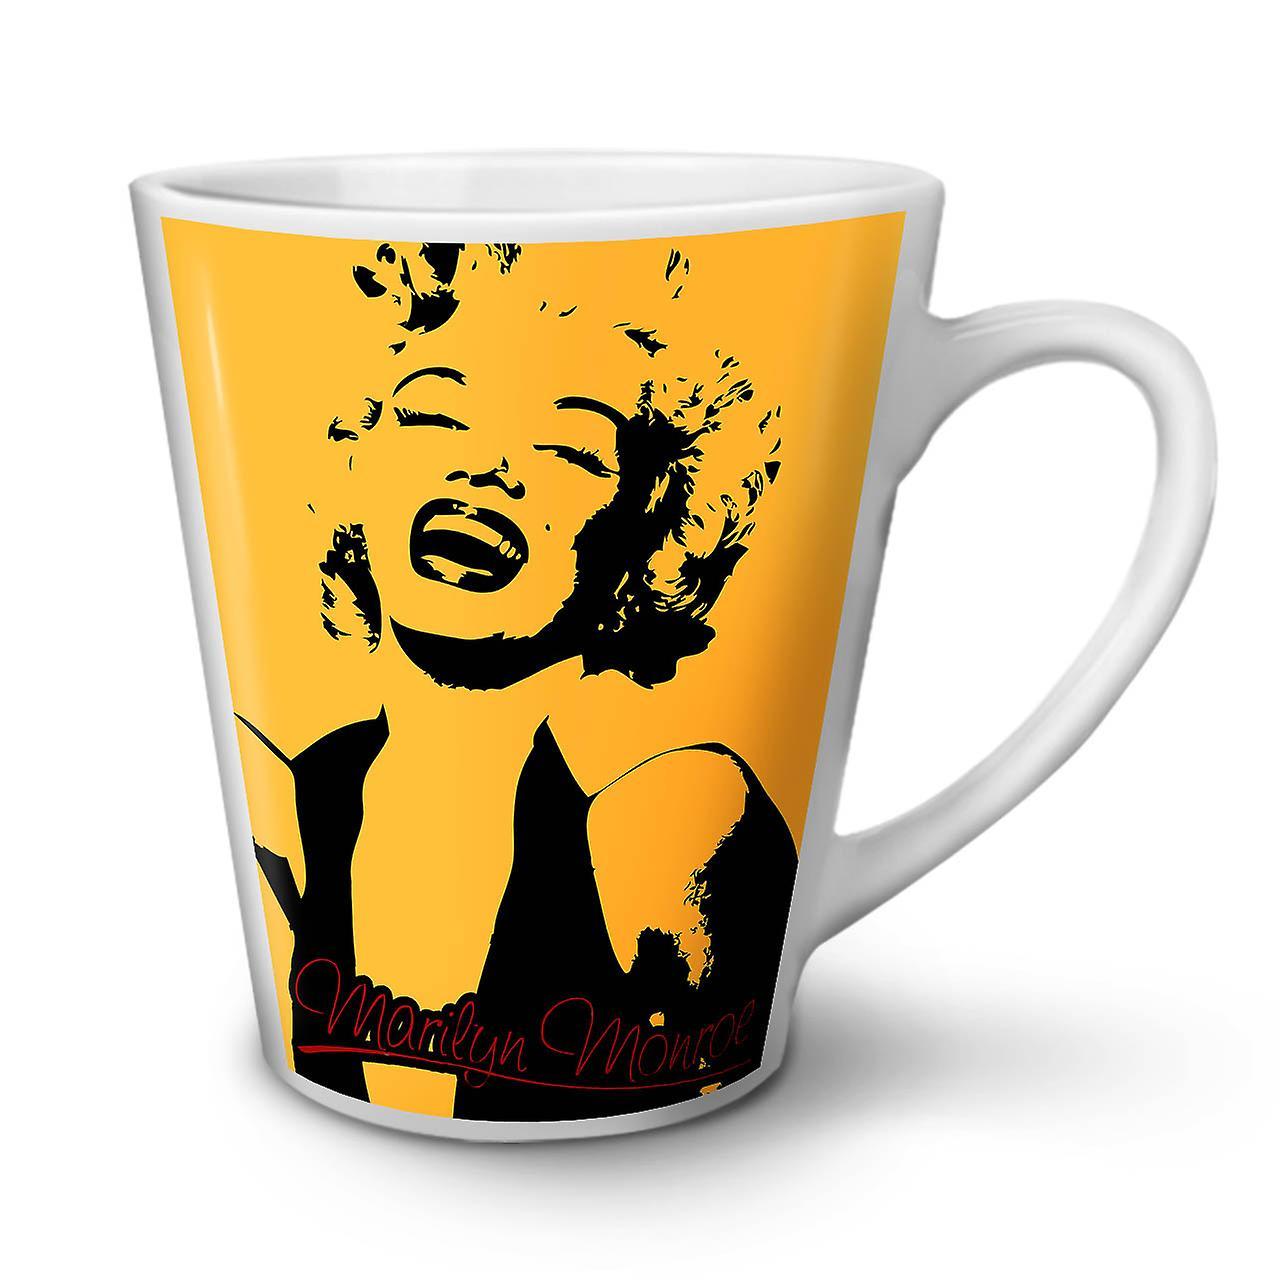 Coffee White Ceramic OzWellcoda New Laugh 12 Latte Mug Tea nPNOwXZ80k